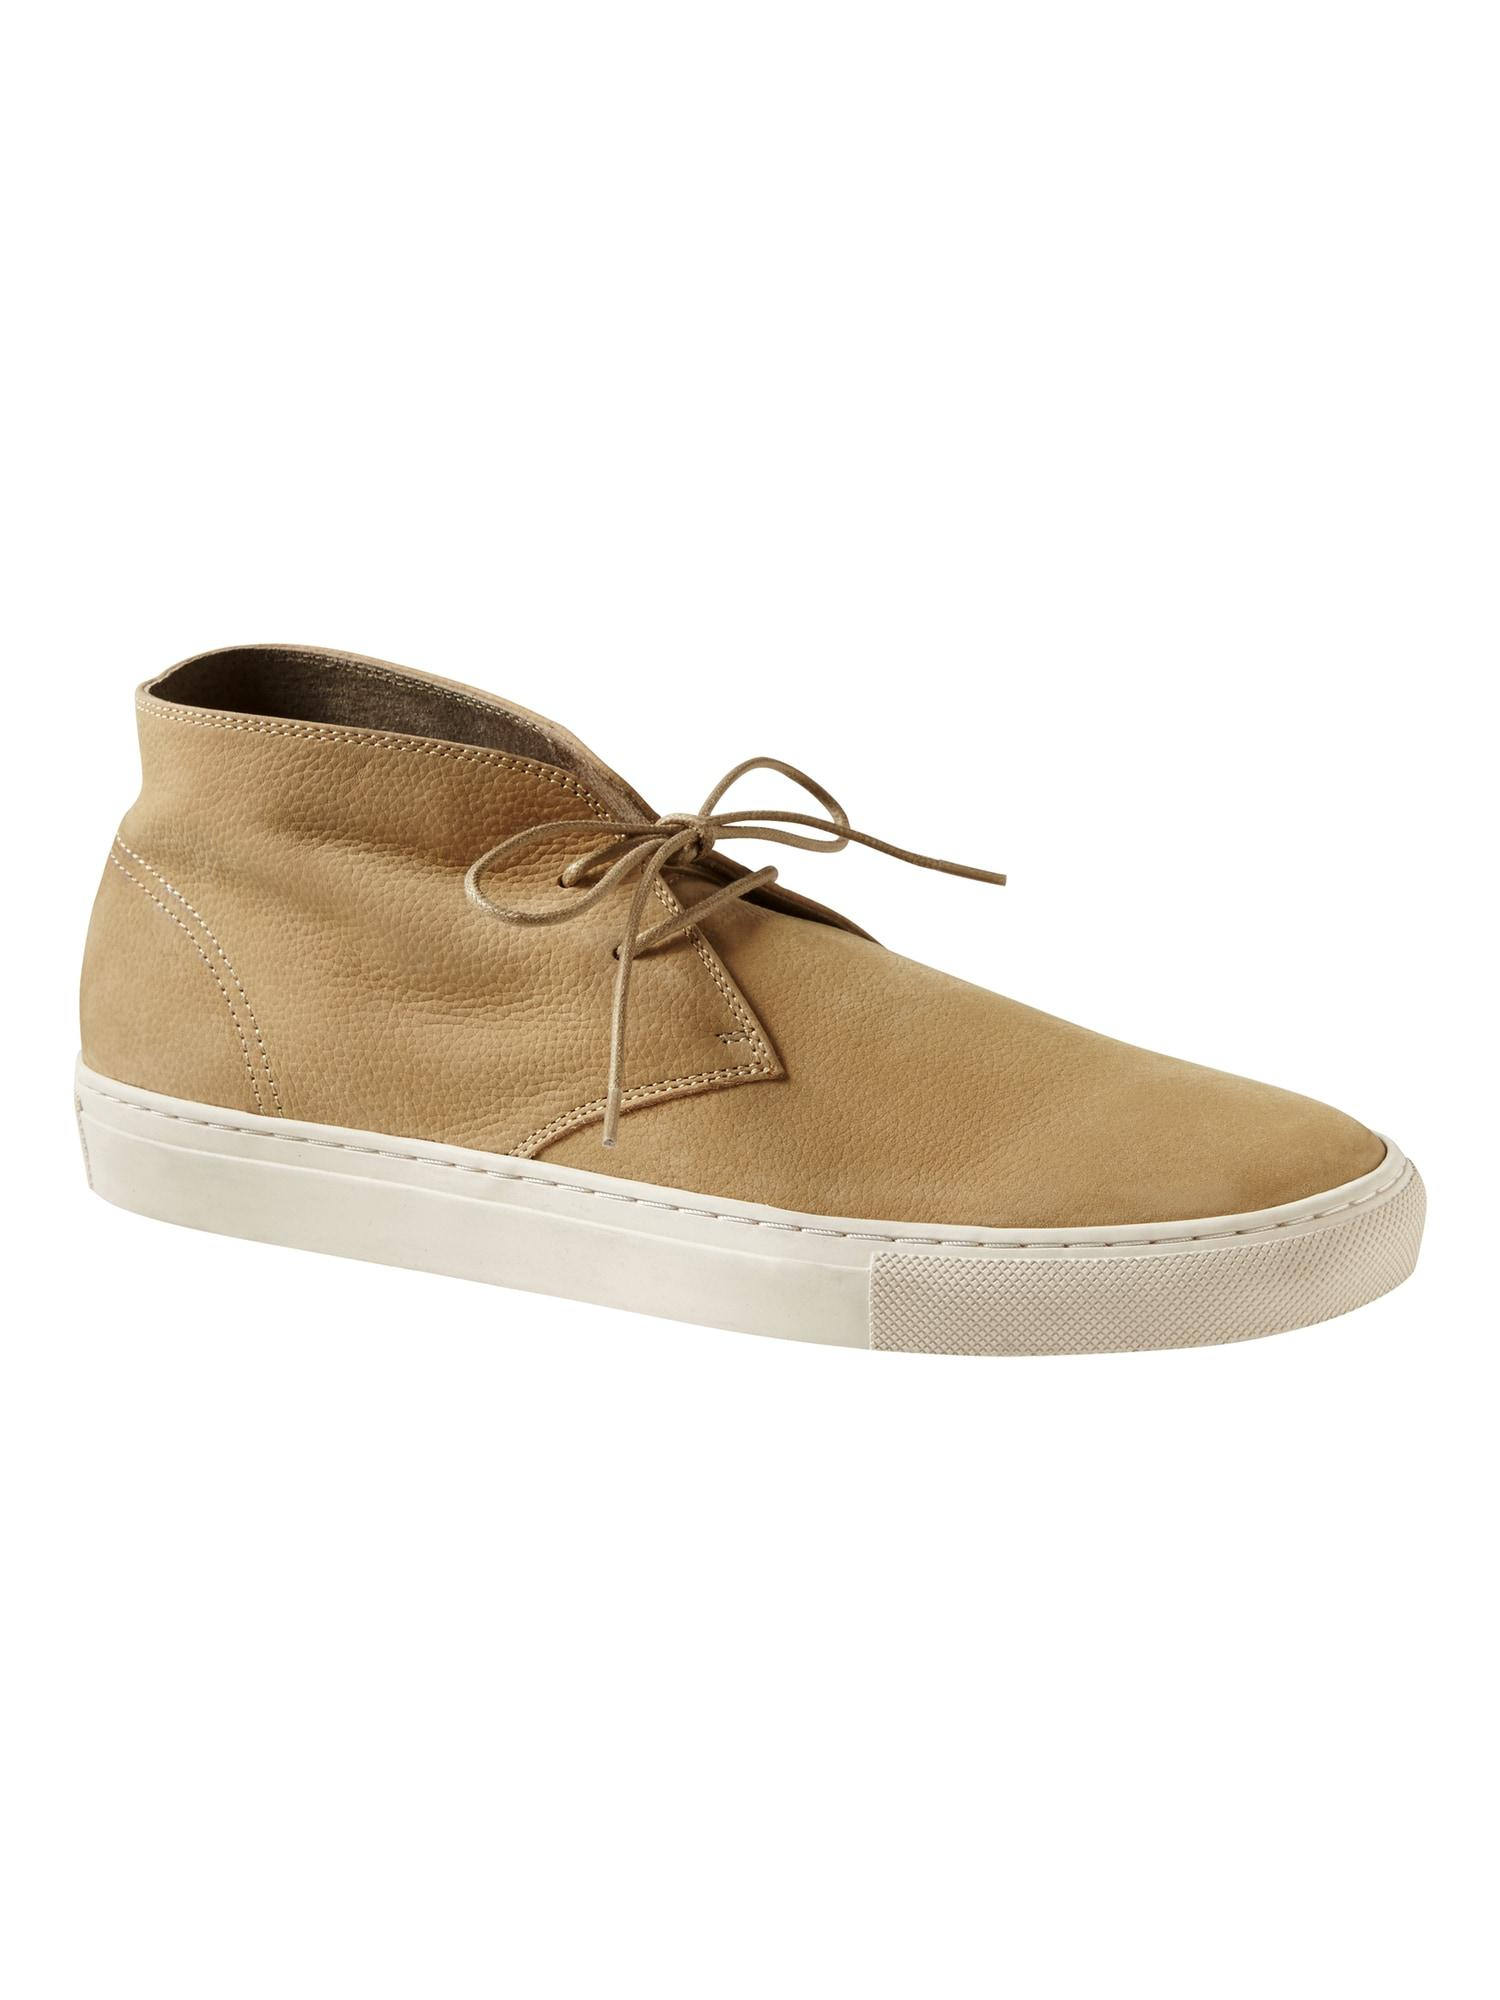 Leather Oldin Sneaker Chukka in Sand